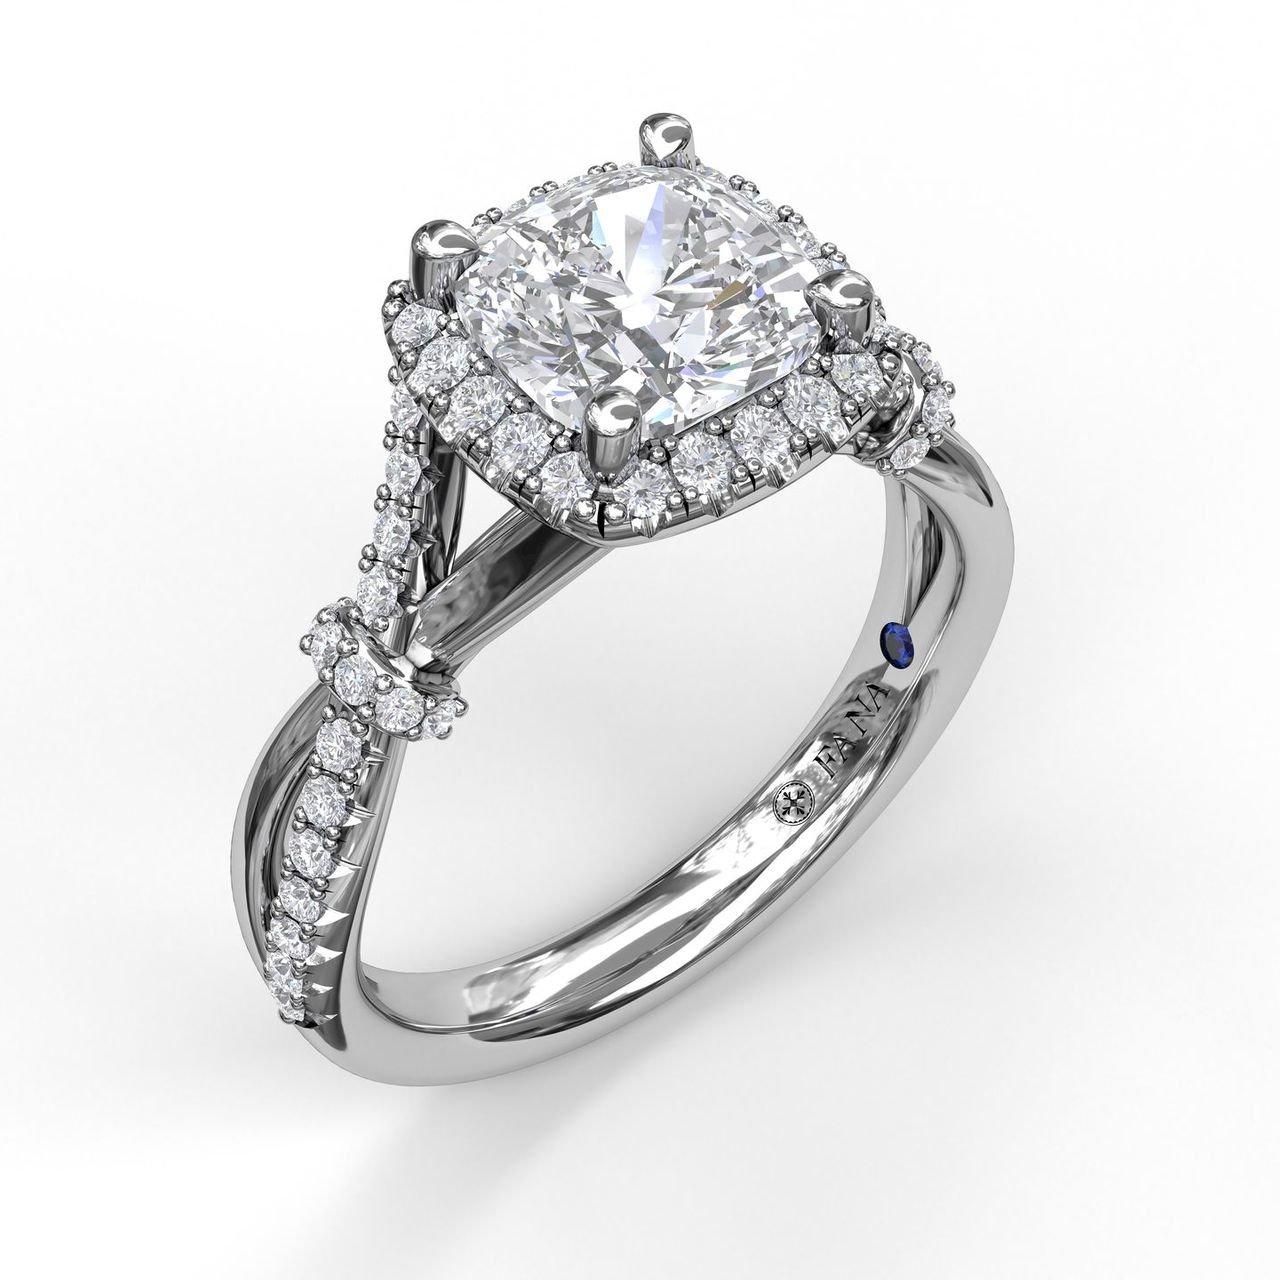 137da4e513330 Fana S3060 Halo and Twist Diamond Ring